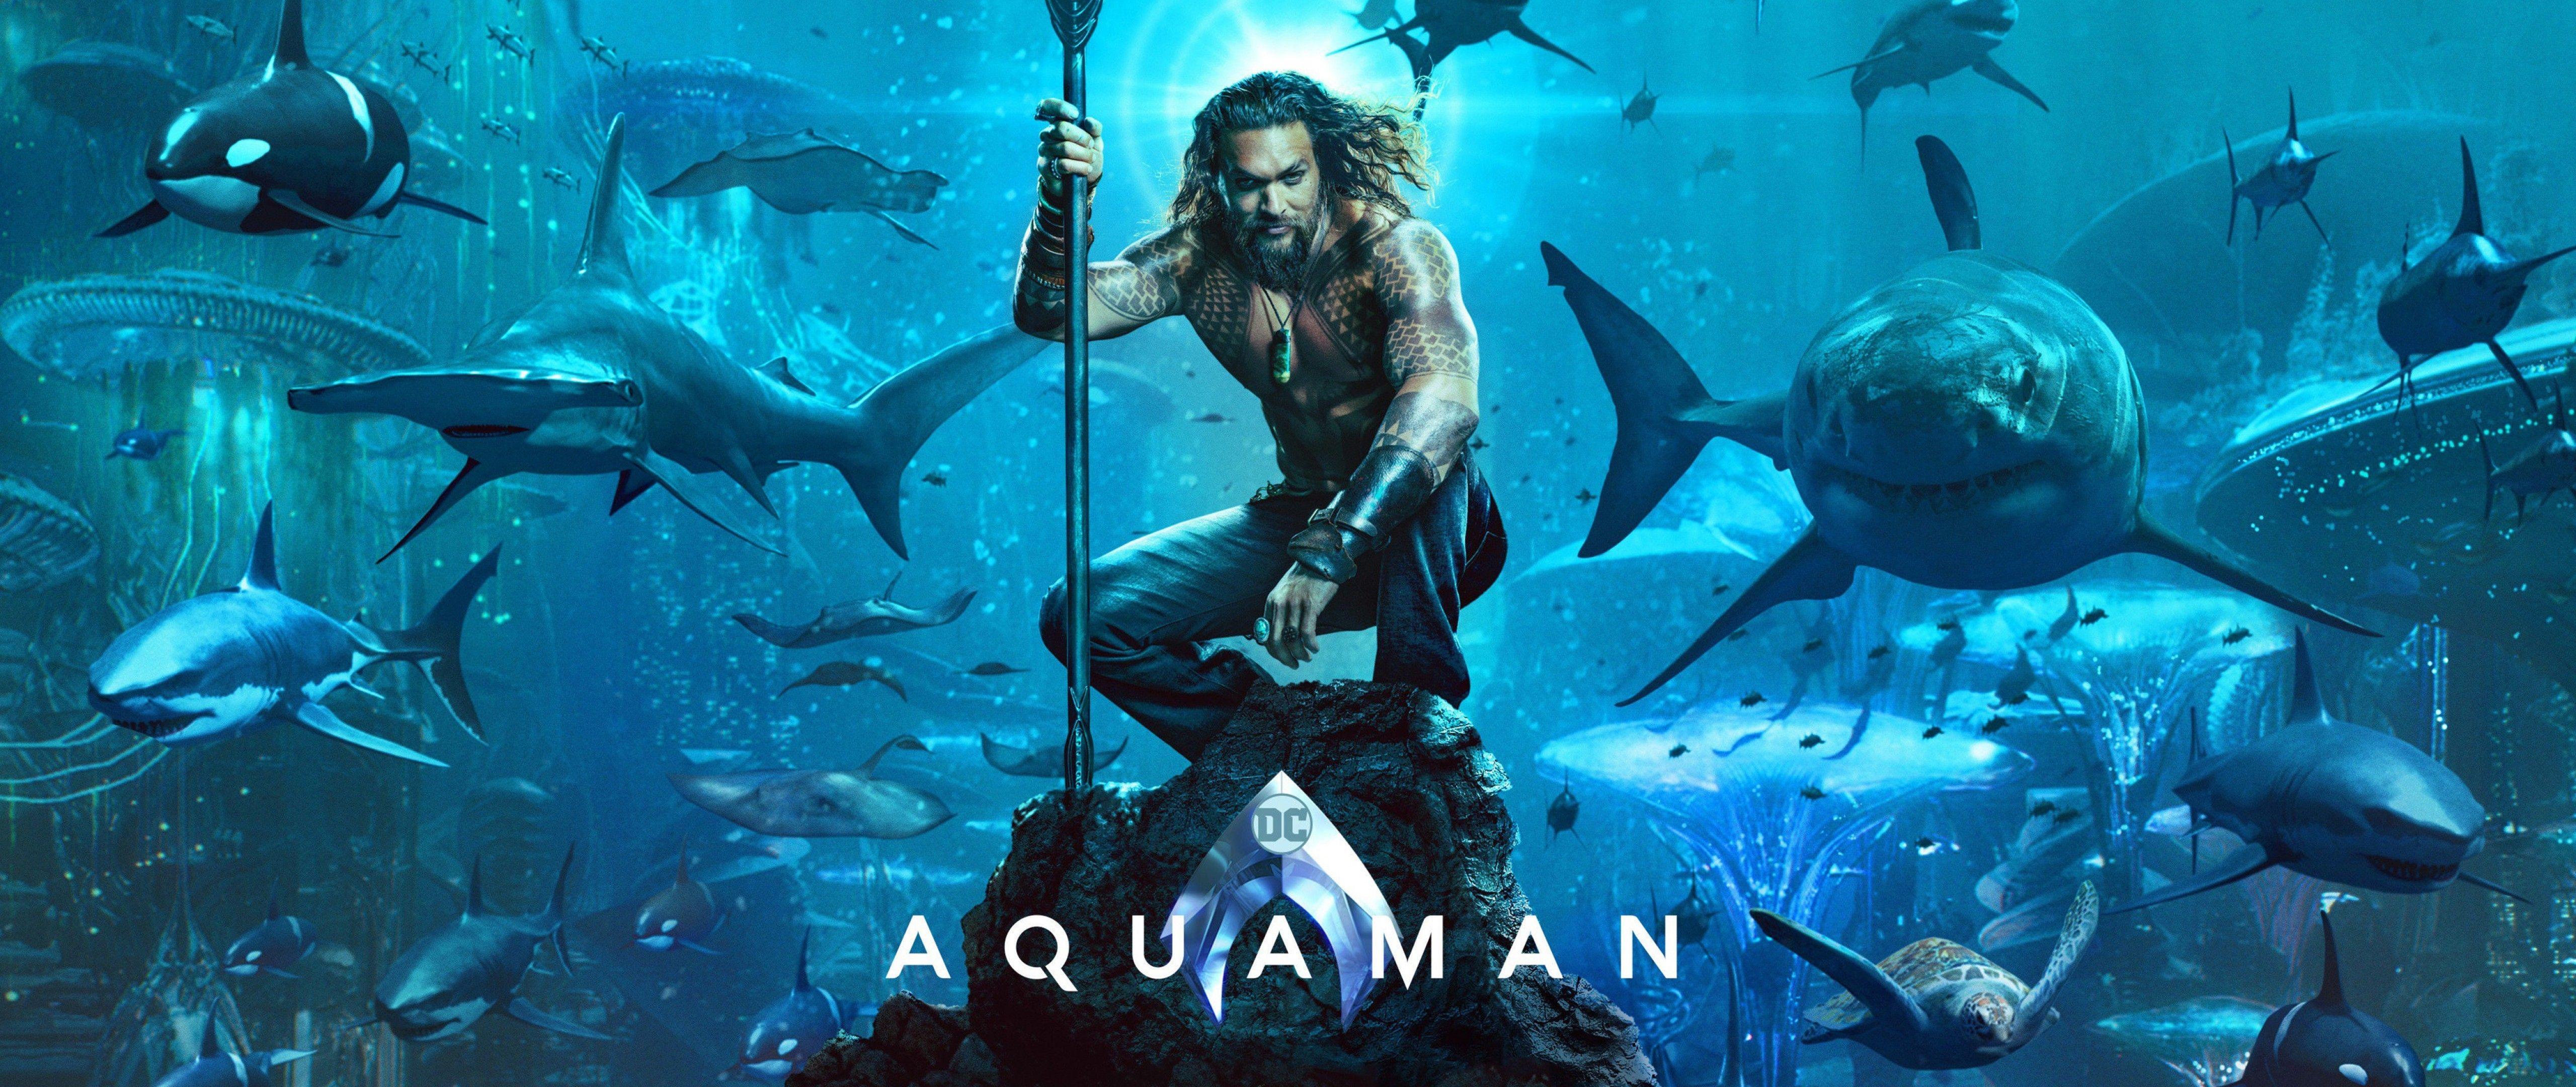 Aquaman 2018 Movie Wallpaper 4k Ultra Hd Wide Tv Https Hdwallpapersmafia Com Aquaman 2018 Movie Wallpaper 4k Ultra Hd Wid Aquaman Aquaman 2018 New Aquaman